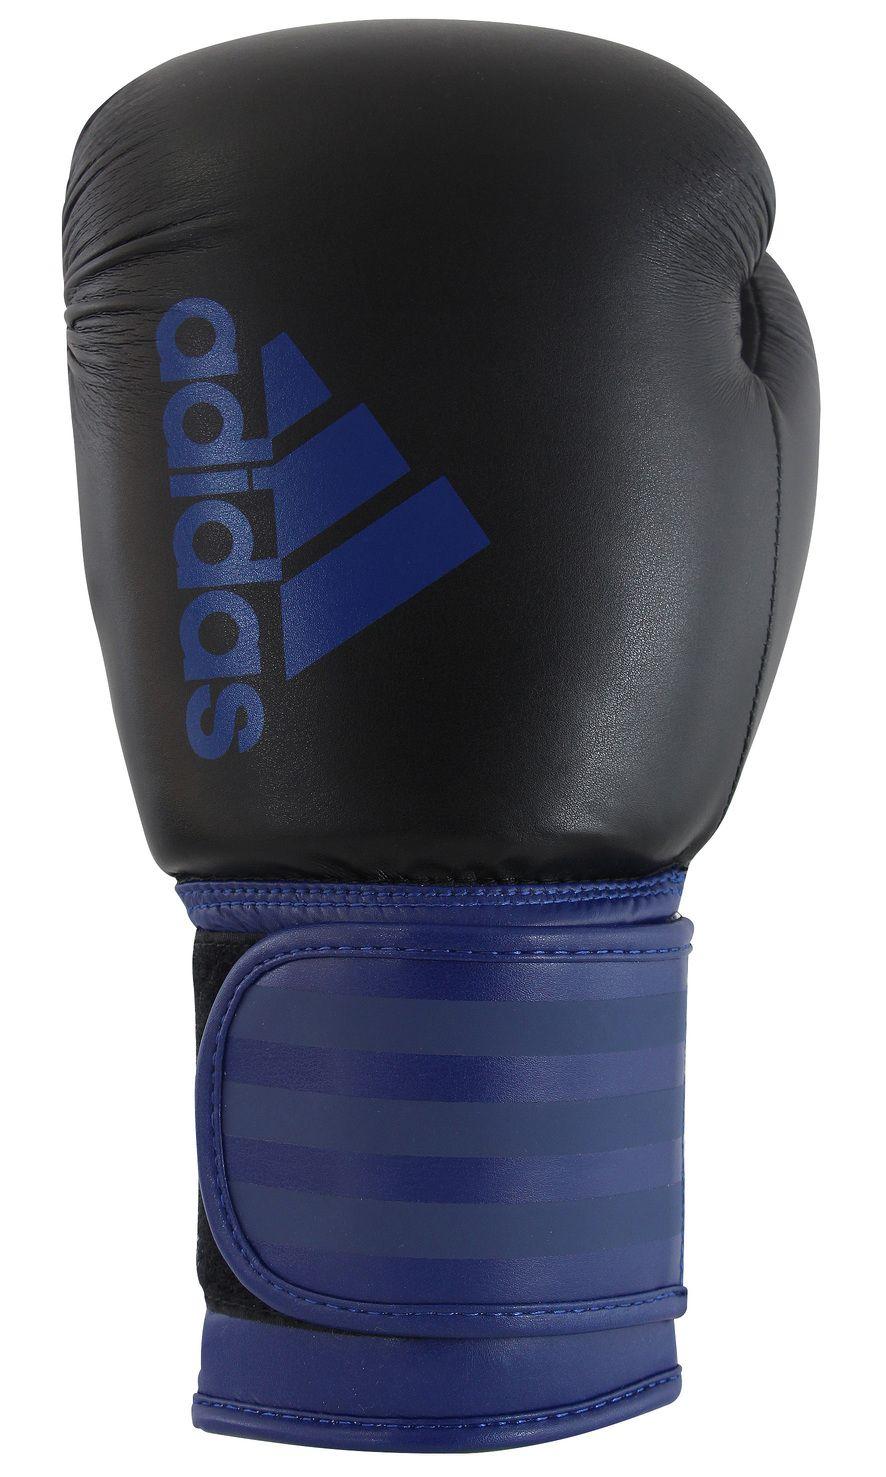 Luva de Boxe Adidas Hybrid100 Mistery Blue/Black